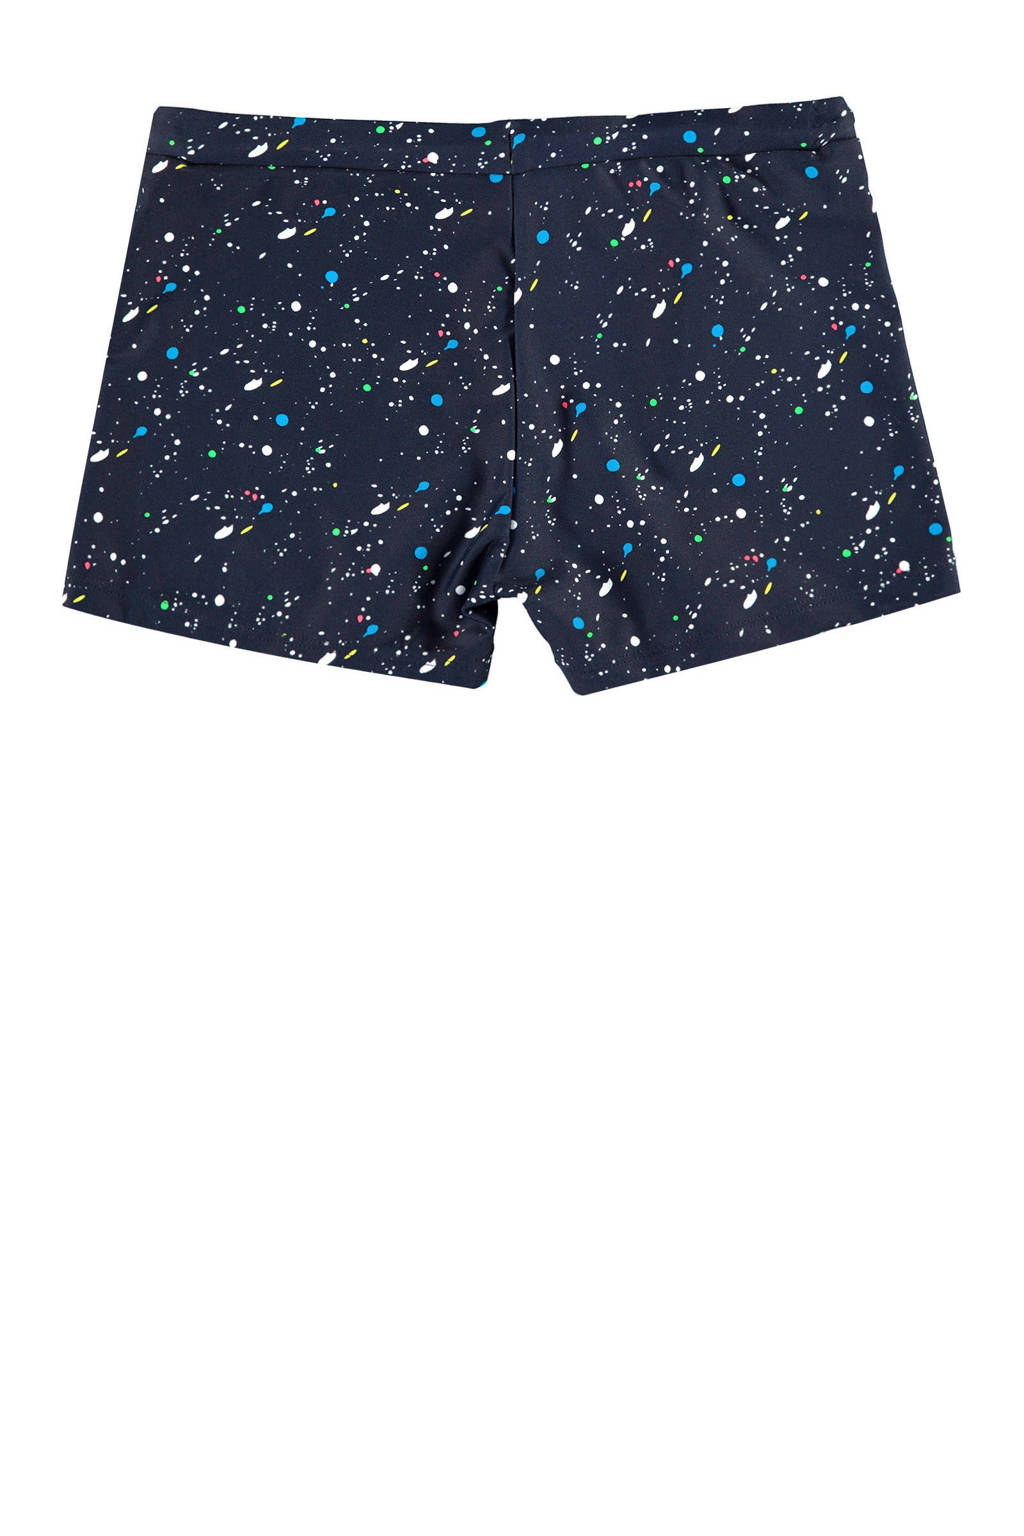 WE Fashion zwemboxer donkerblauw, Donkerblauw